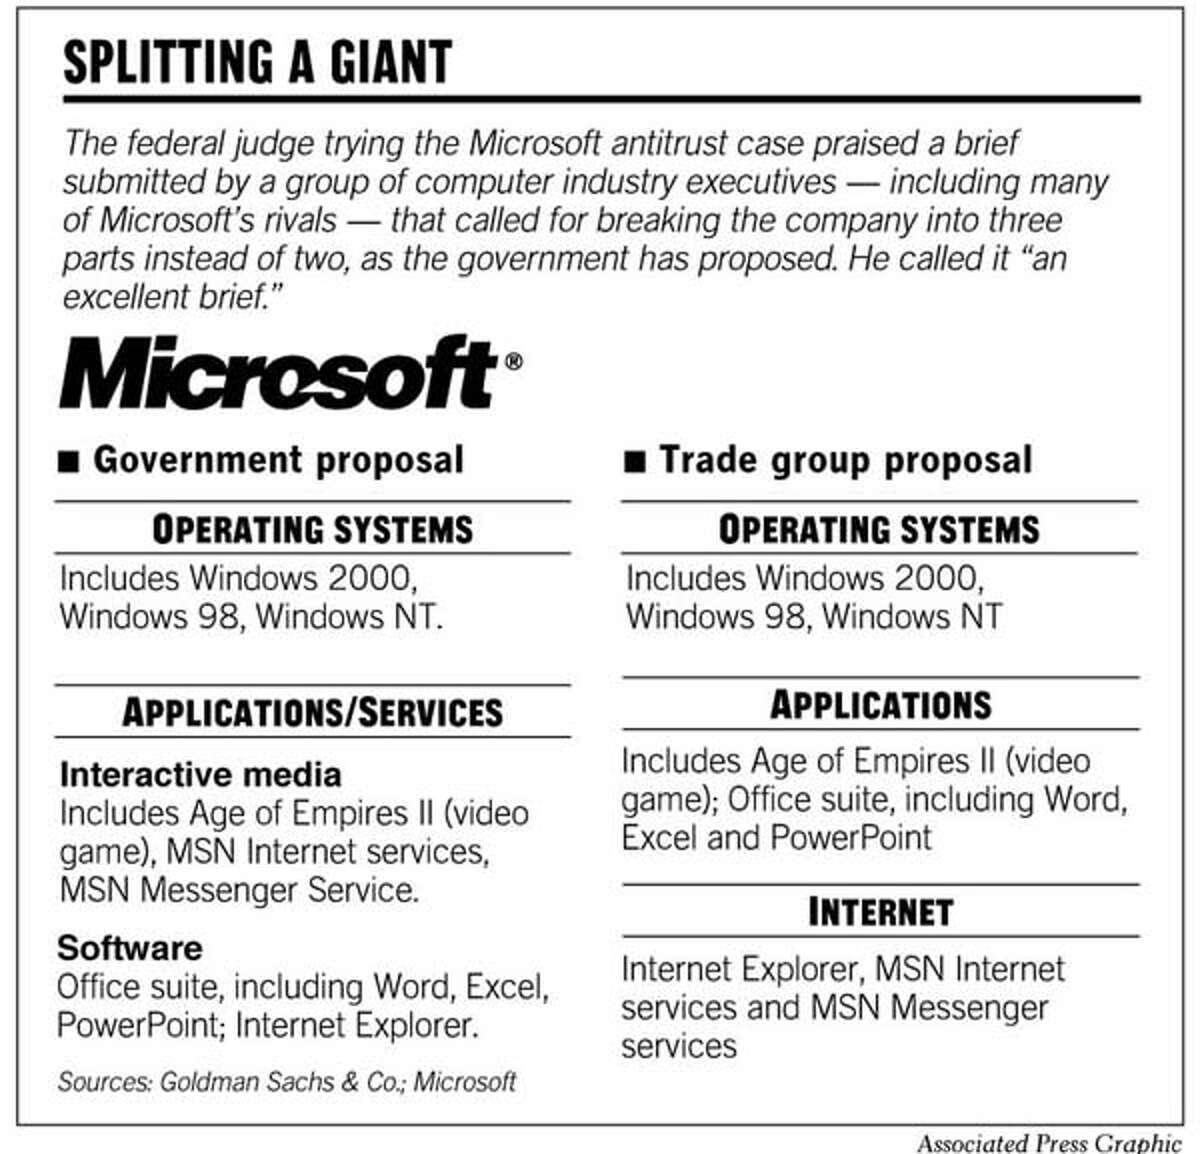 Splitting A Giant. AP Graphic